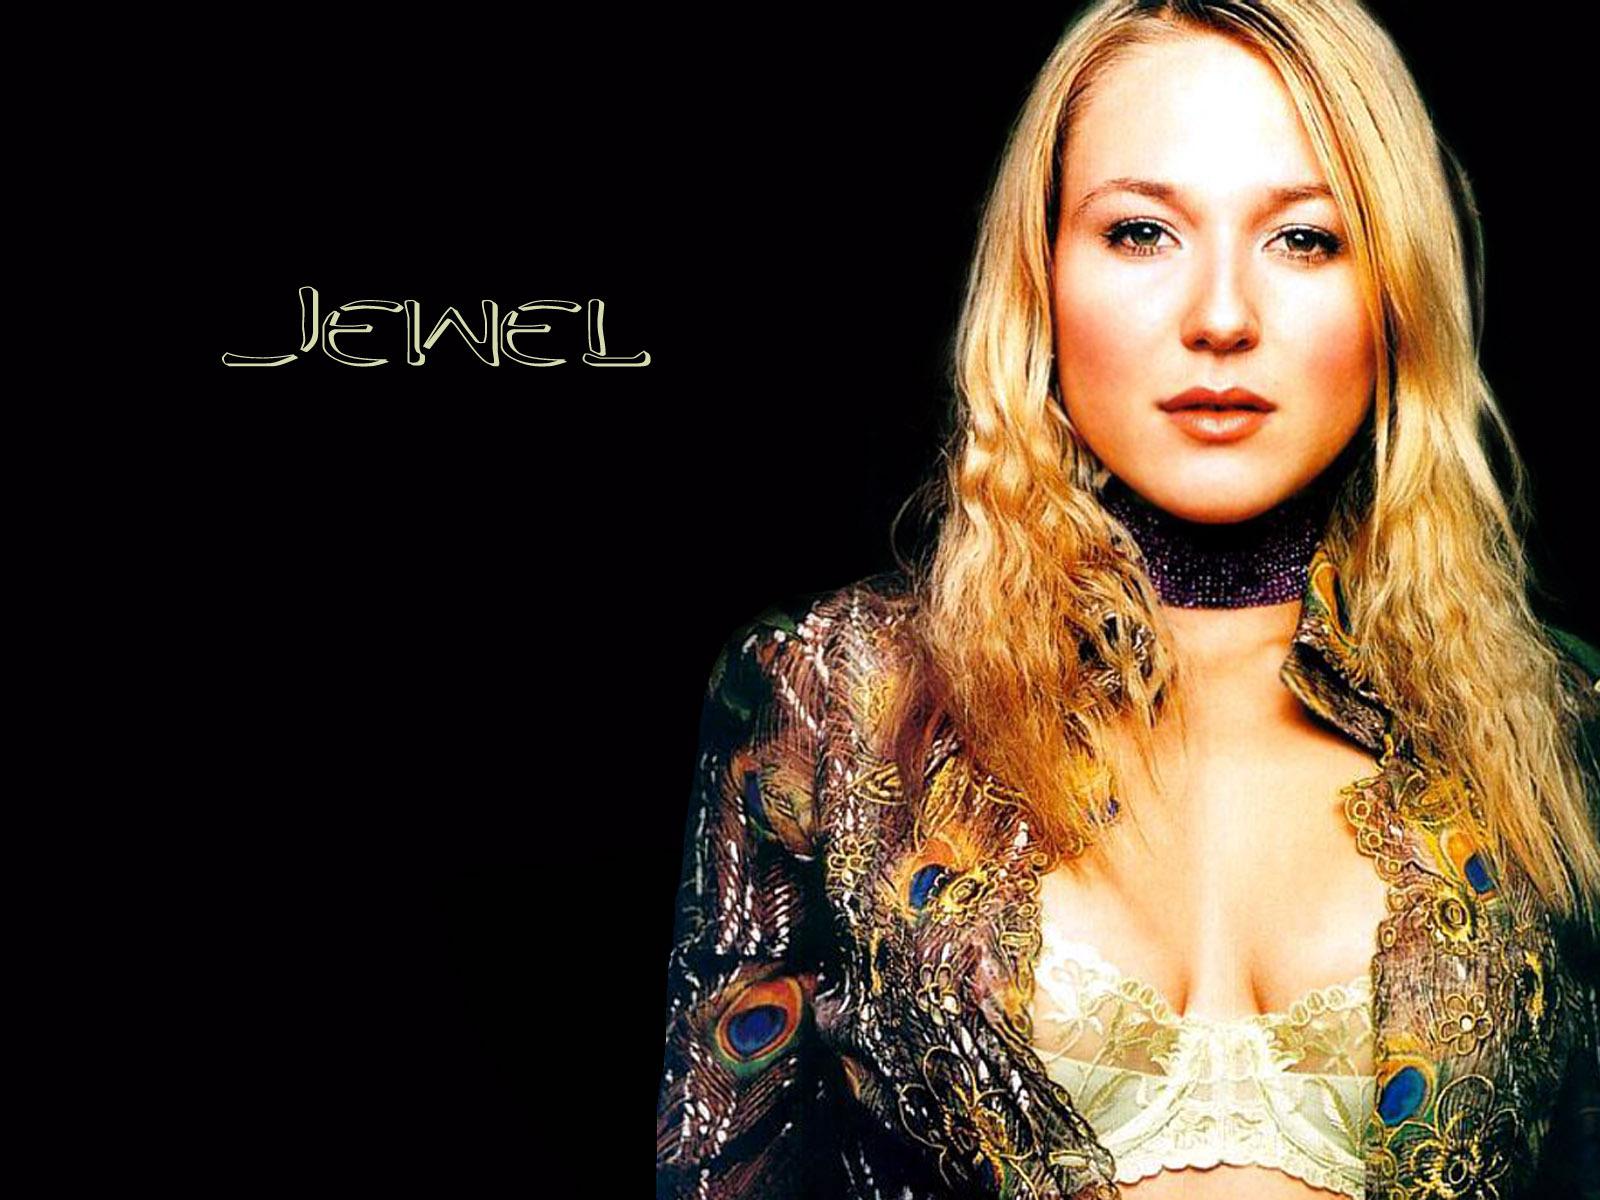 Jewel jewel wallpaper 20916671 fanpop for Jewel wallpaper